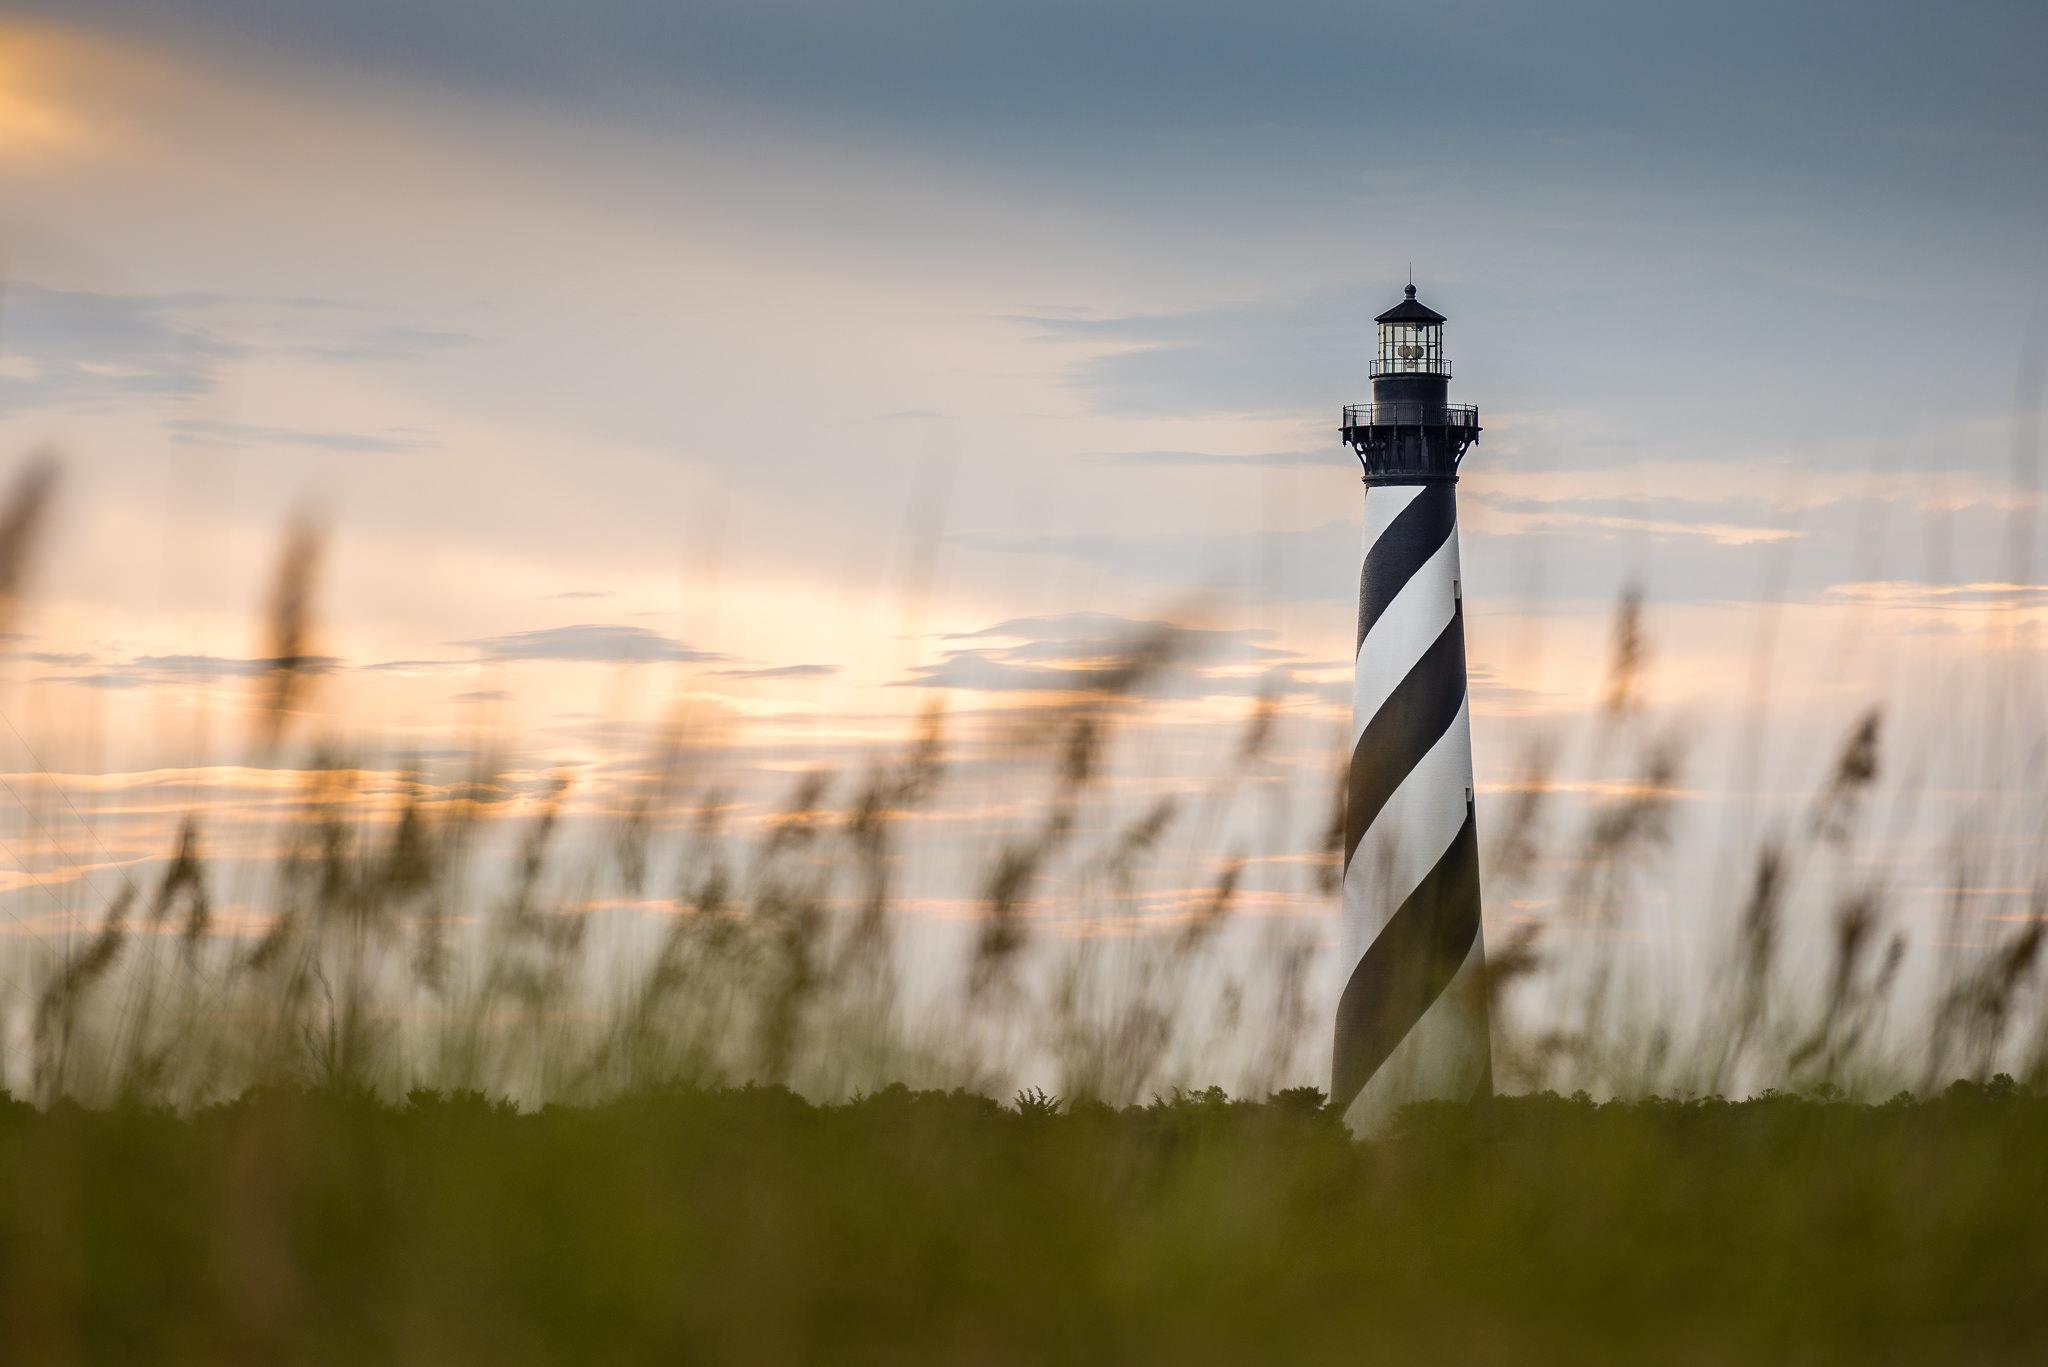 Cape Hatteras Lighthouse - Best Photo Spots